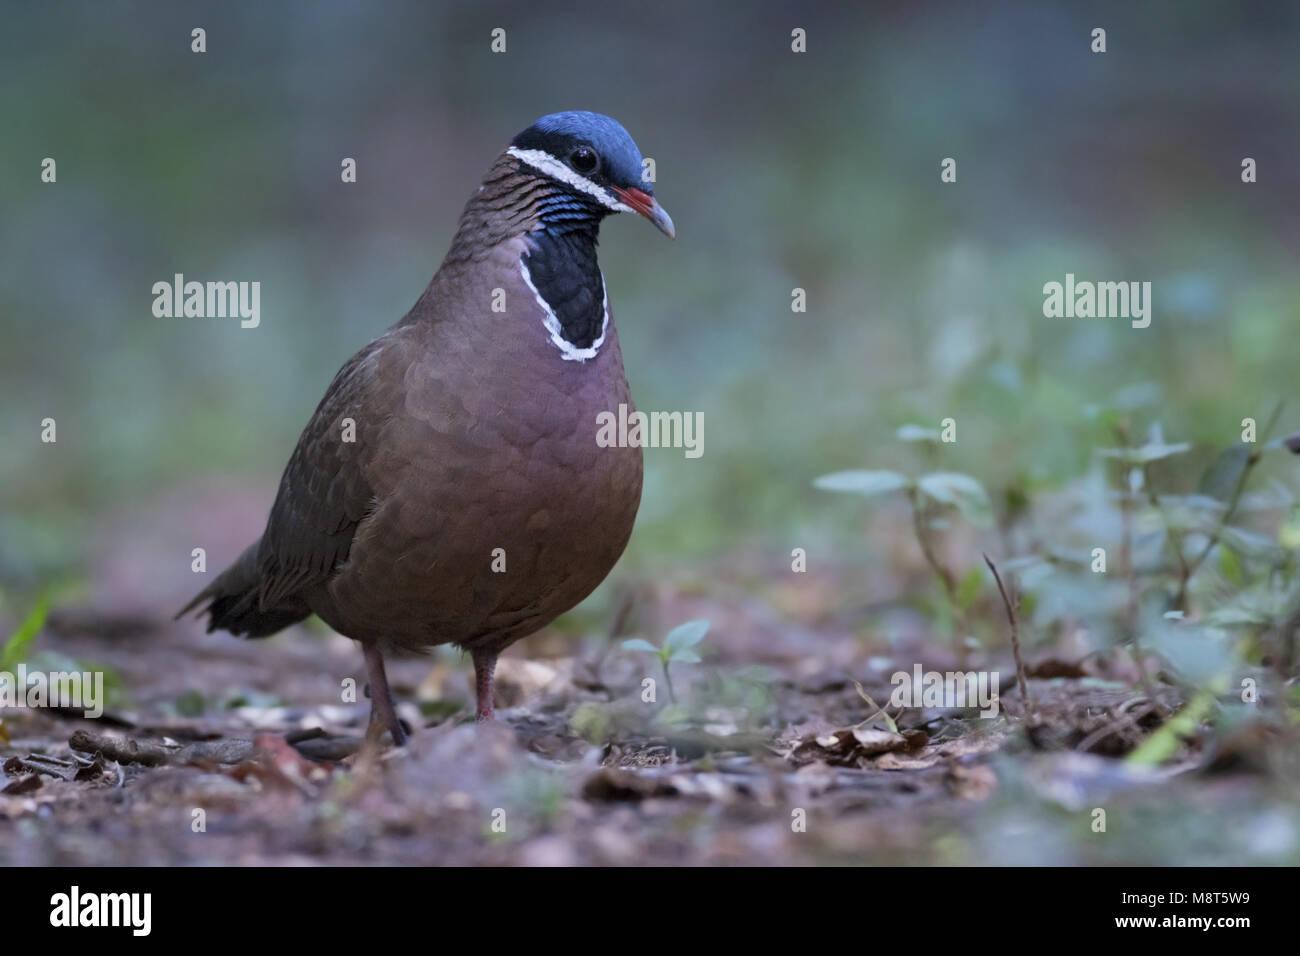 Blauwkopkwartelduif, Blue-headed Quail-Dove, Starnoenas cyanocephala Stock Photo